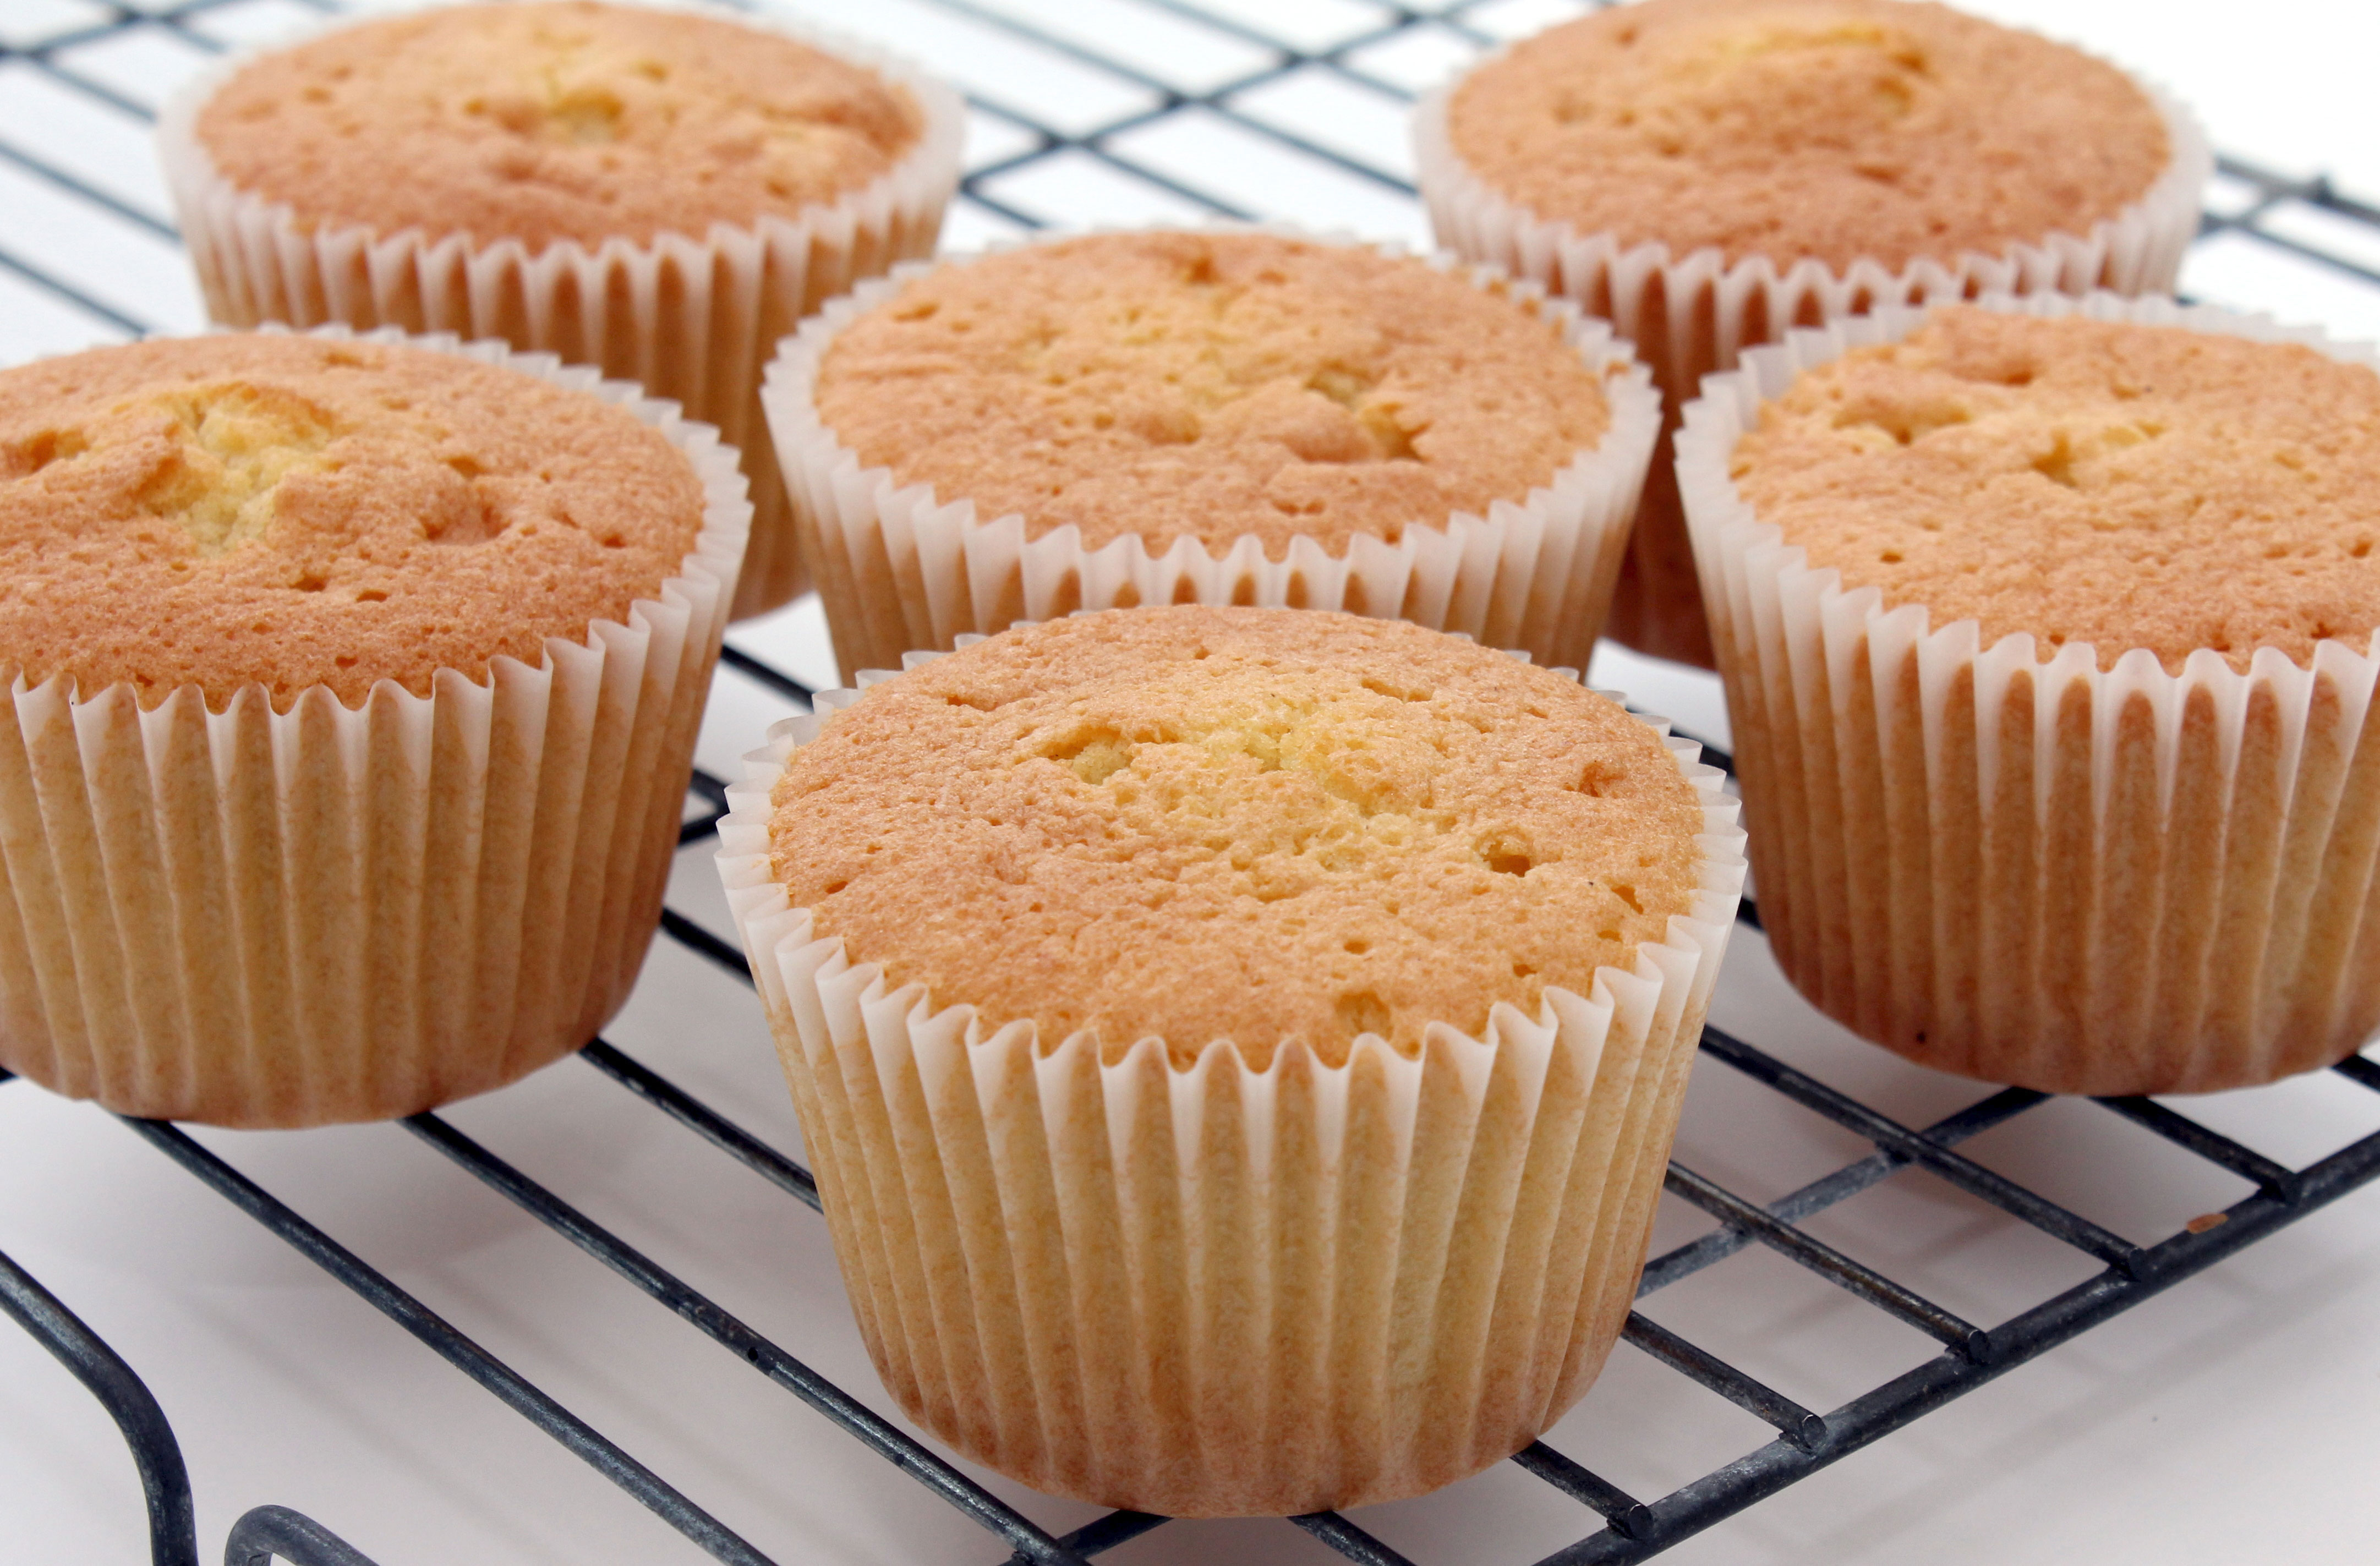 Basic Cupcake